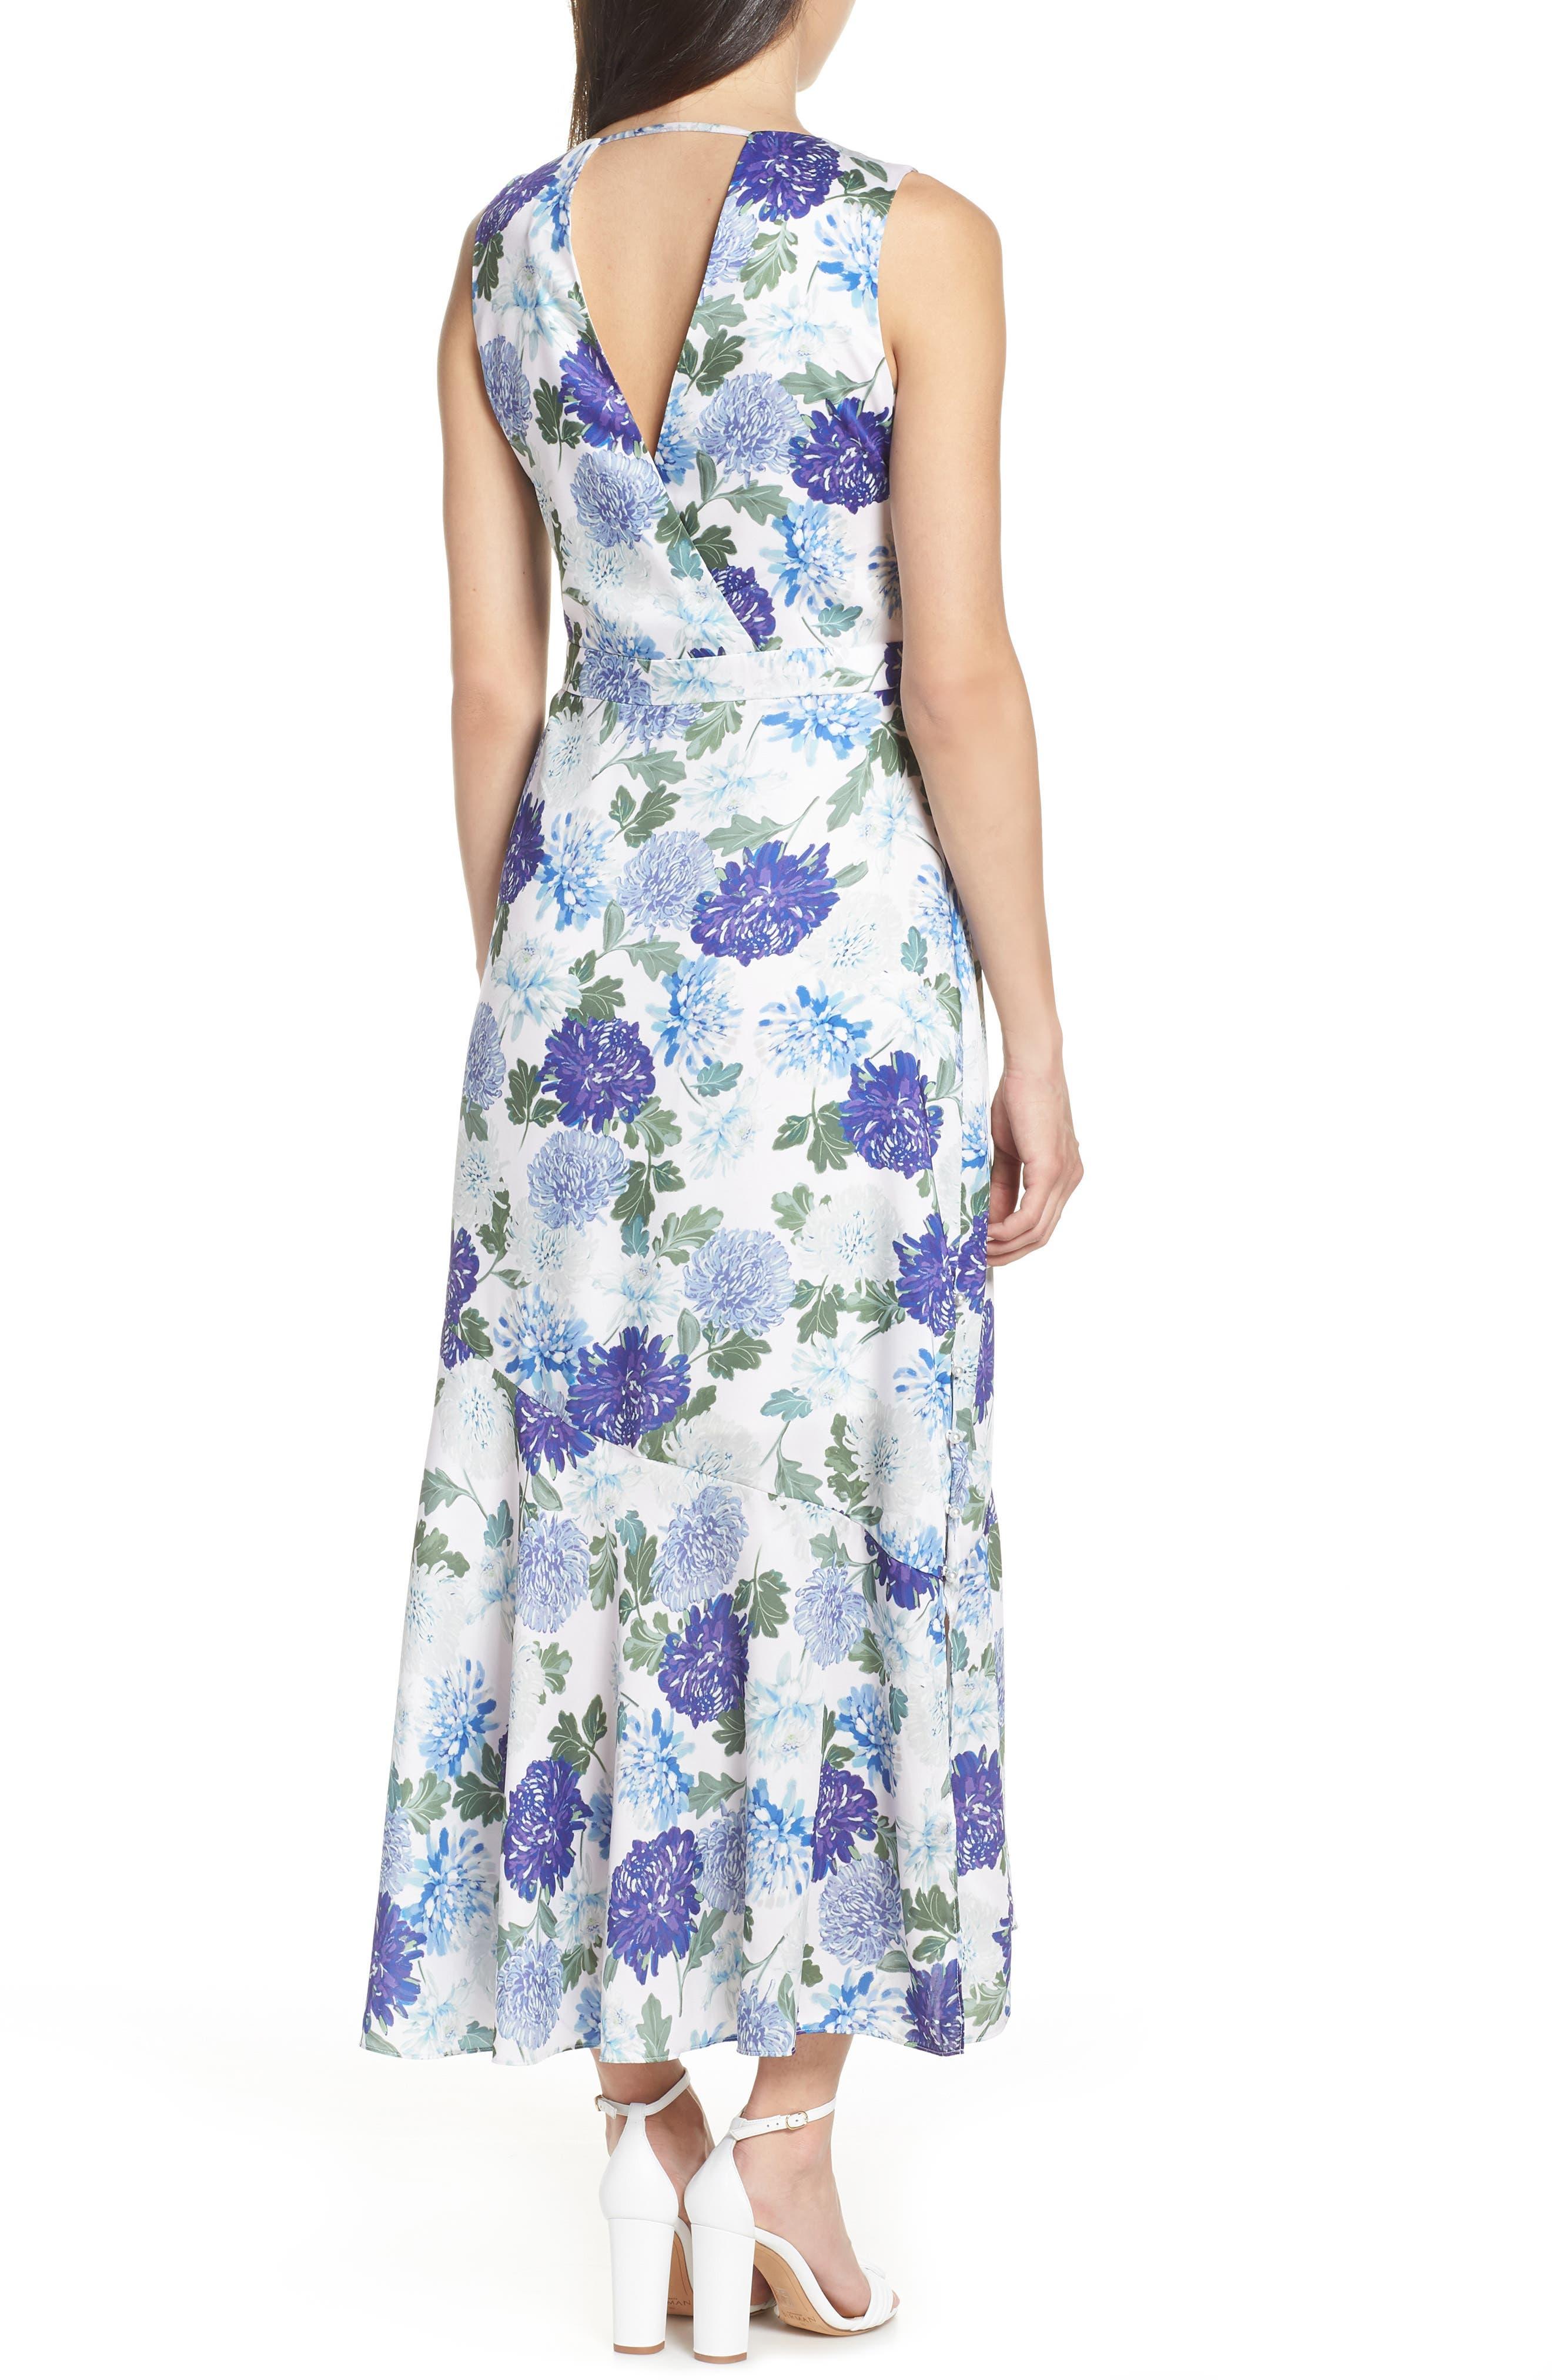 SAM EDELMAN, Vintage Floral Midi Dress, Alternate thumbnail 2, color, PURPLE MULTI